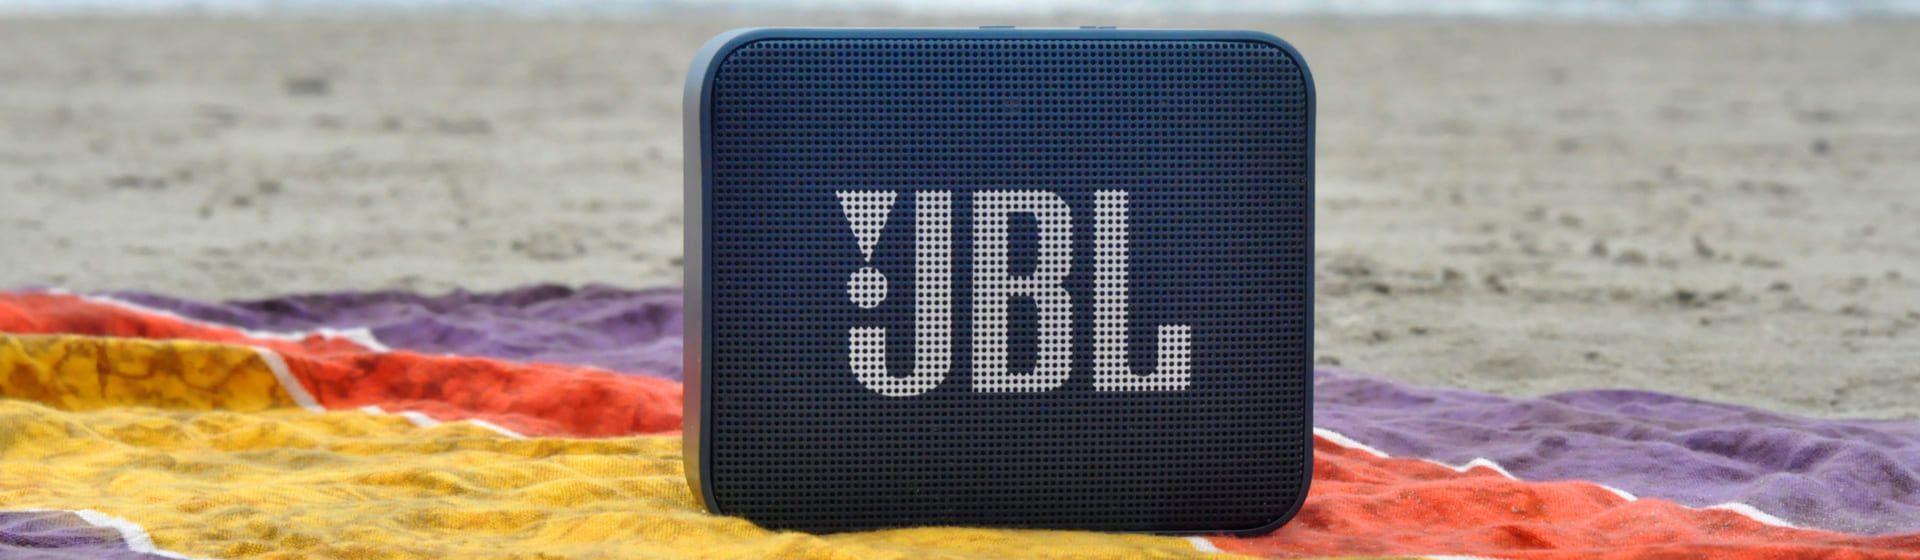 JBL Go 2 vale a pena? Tudo sobre a caixa de som bluetooth compacta